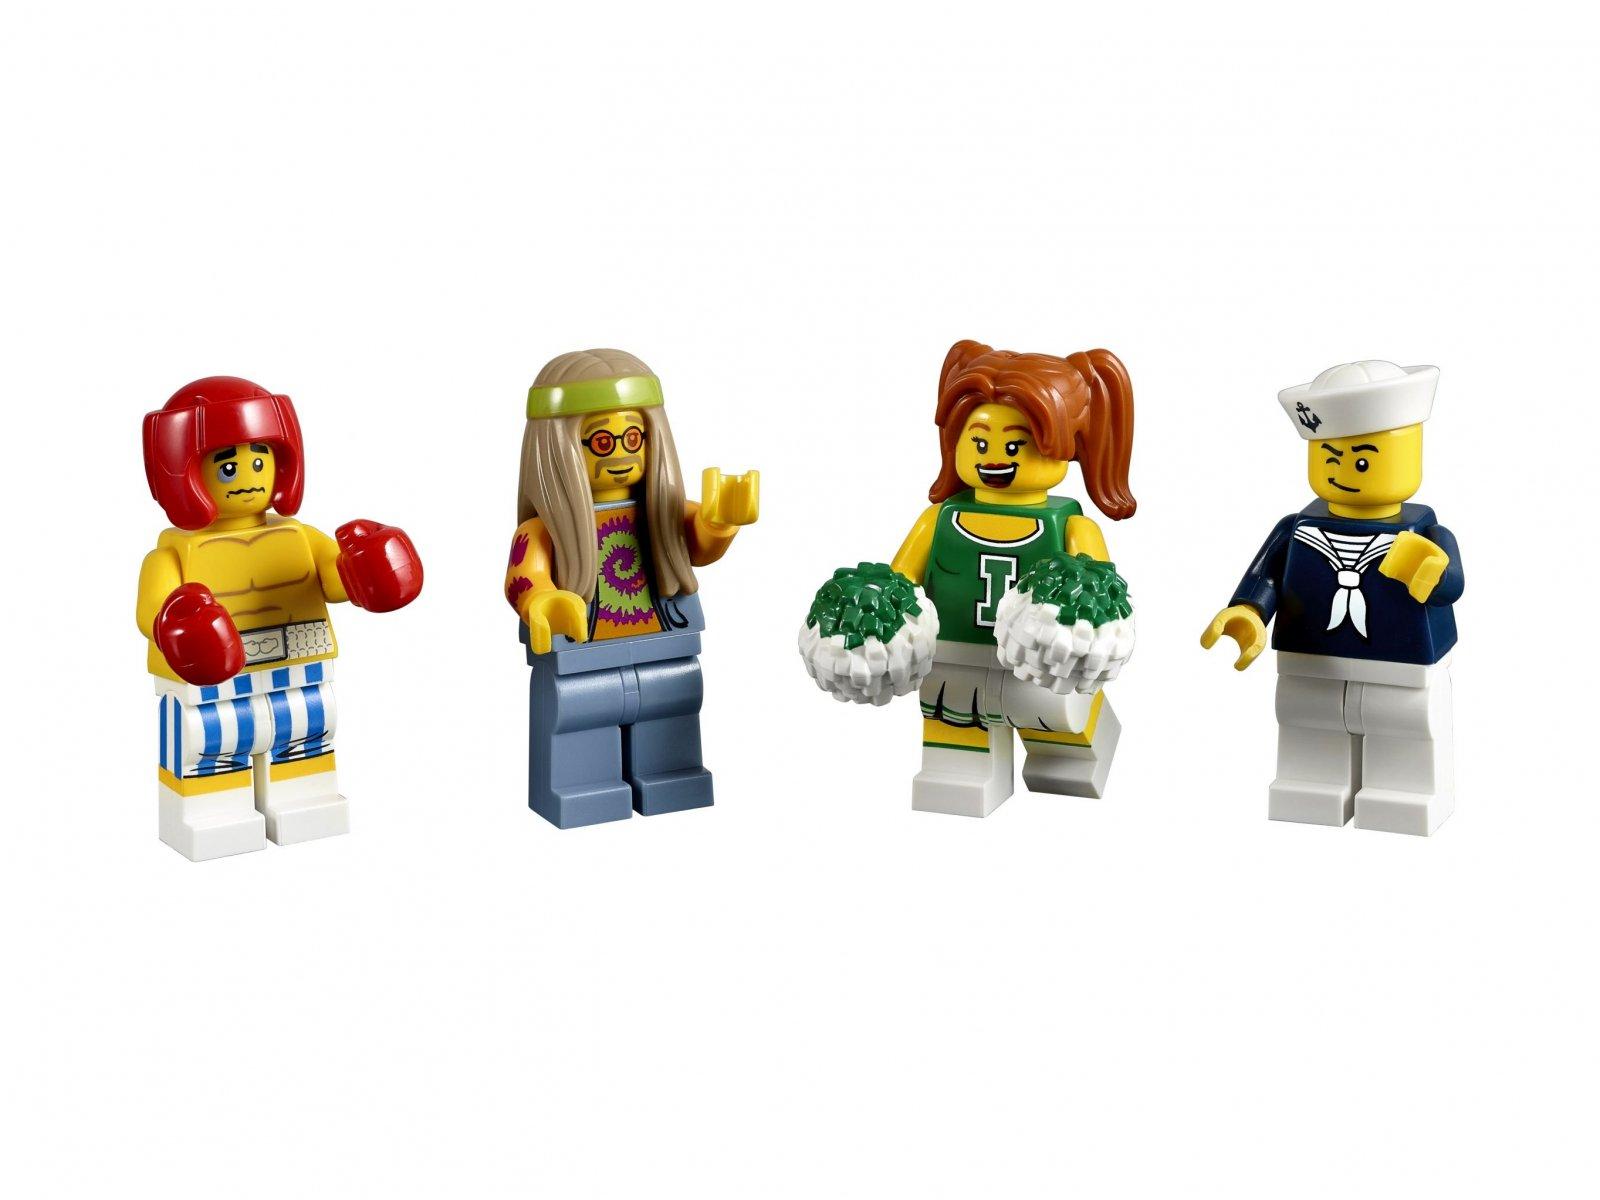 LEGO 5004941 Bricktober - zestaw minifigurek